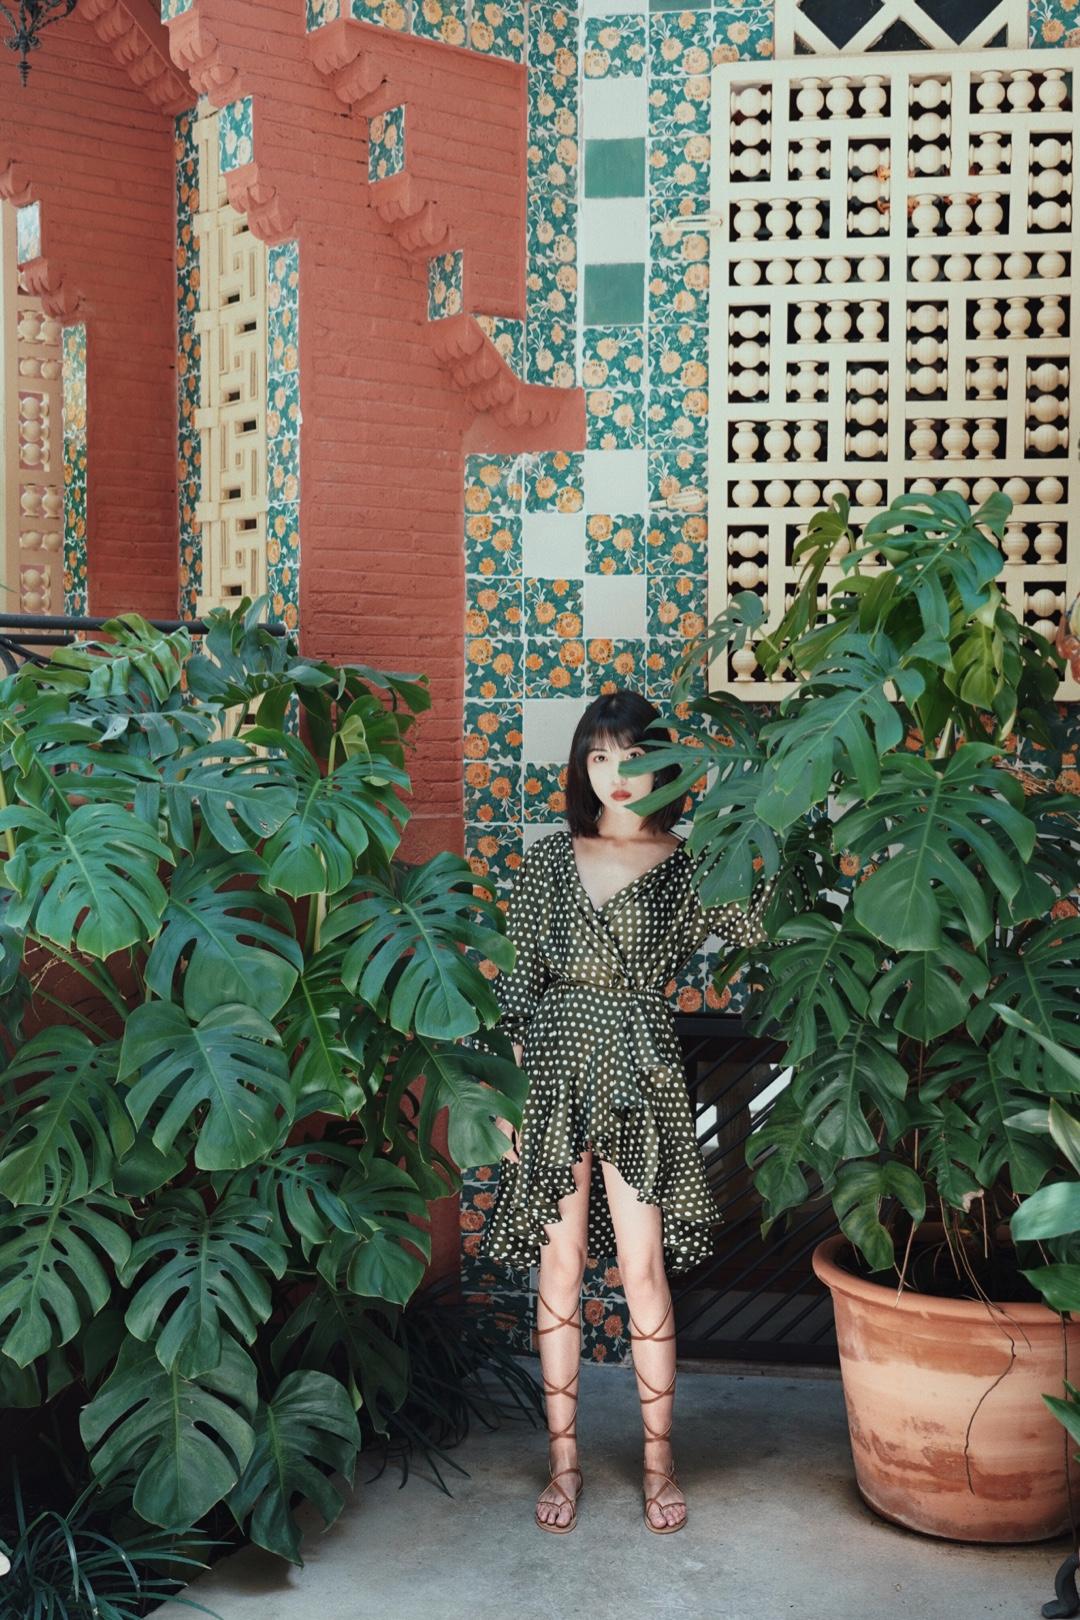 【Valerie's OOTD】Vol.276 我最喜欢的夏日穿搭除了清新自然的碎花装、大方简单的极简风,还有波西米亚风,这种风格也同样很适合度假出游。 我身上这条连衣裙,是好看的不挑人的显摆墨绿色,波点印花让它有点俏皮。裙摆的不规则荷叶边设计,让它看起来非常蓬松也很有女人感,领子的荷叶边和裙摆相呼应,露出最显瘦的锁骨,大露背设计也很小心机了。 再搭配一双绑带凉鞋,一套非常波西米亚的夏日穿搭就ok啦。 #小性感!是我夏天的关键词#